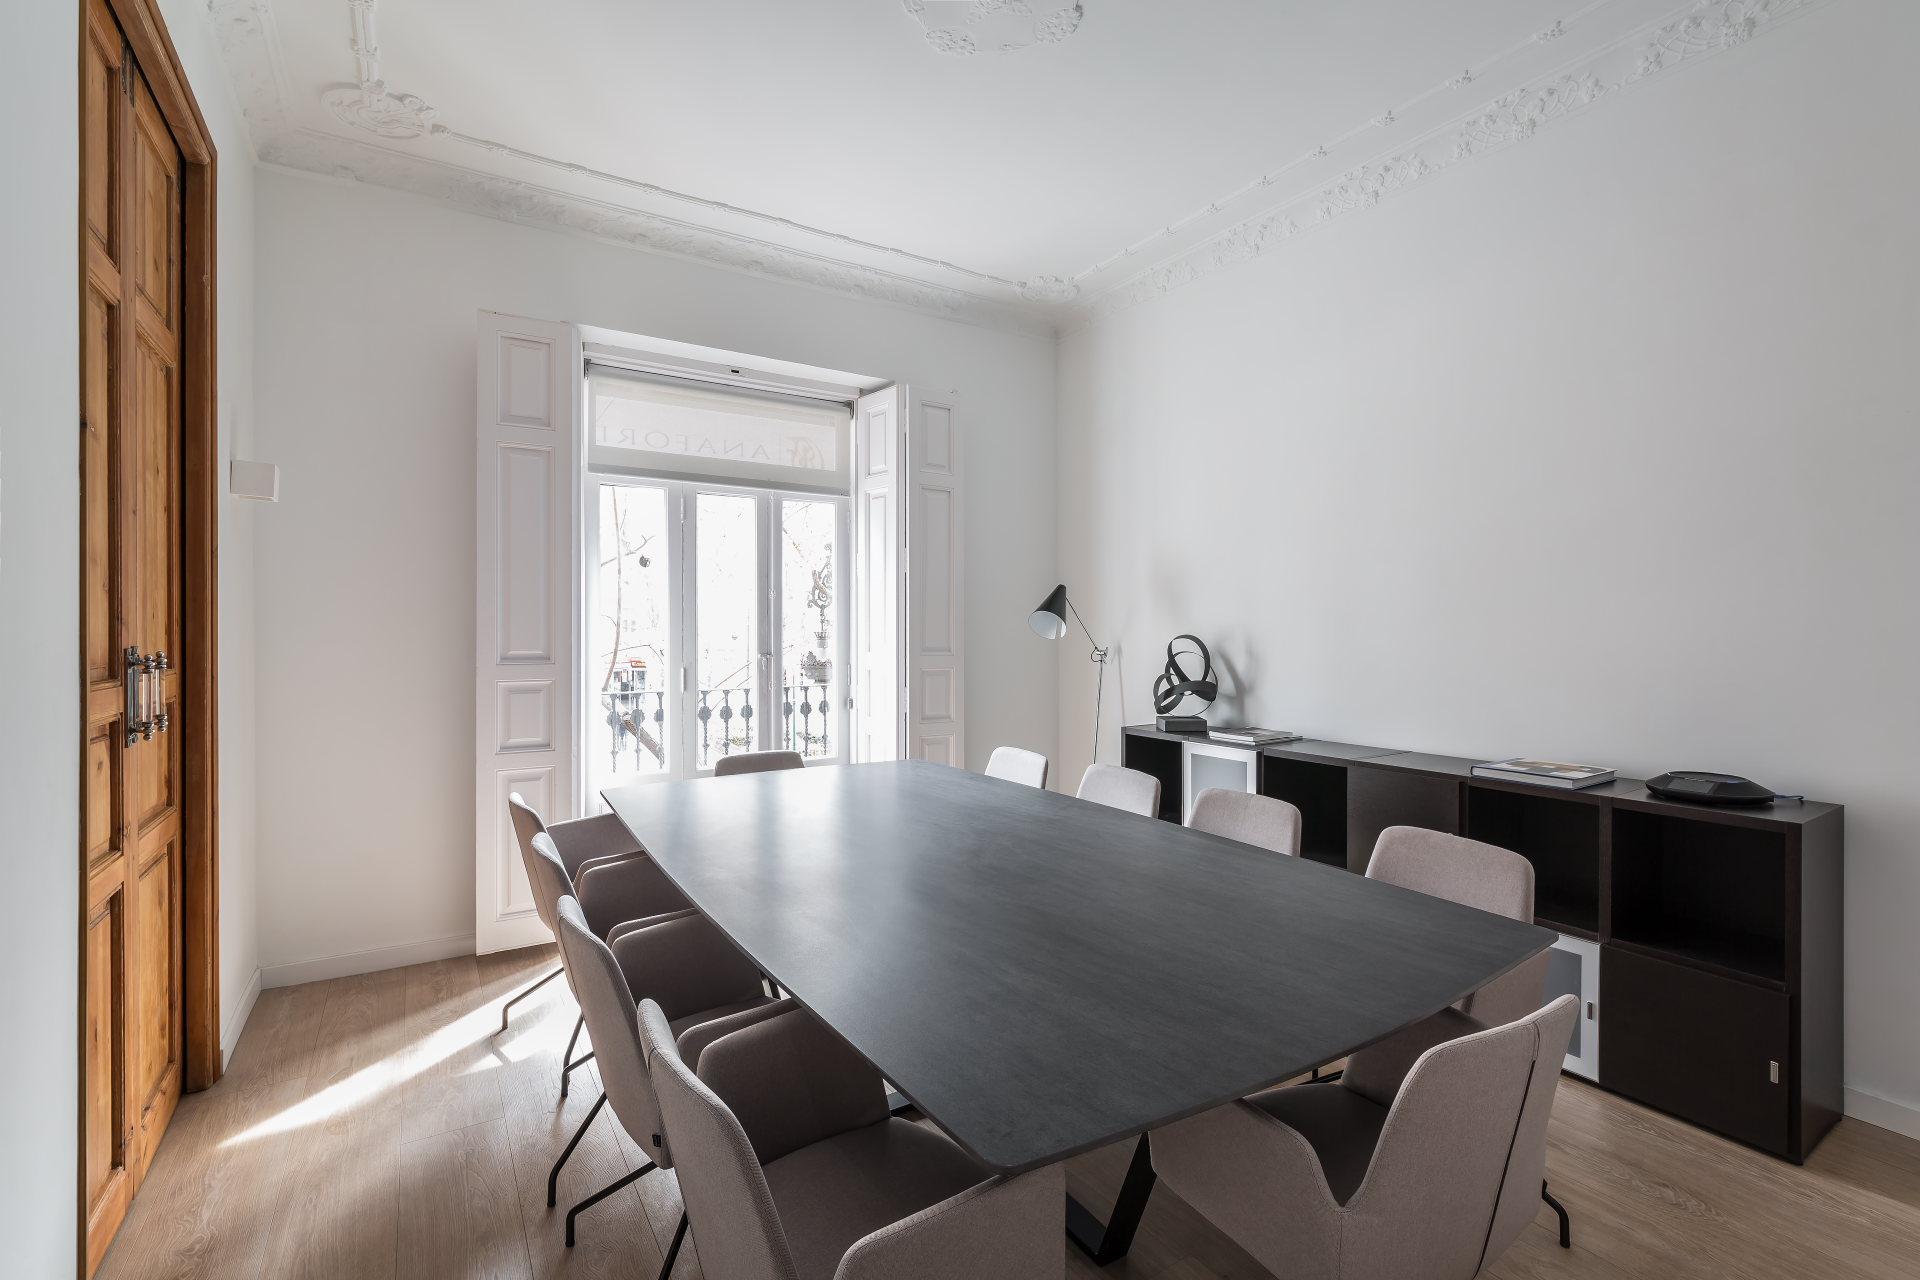 fotografia-arquitectura-valencia-german-cabo-d'estudio-despacho-oficinas-anaford-abogados (4)